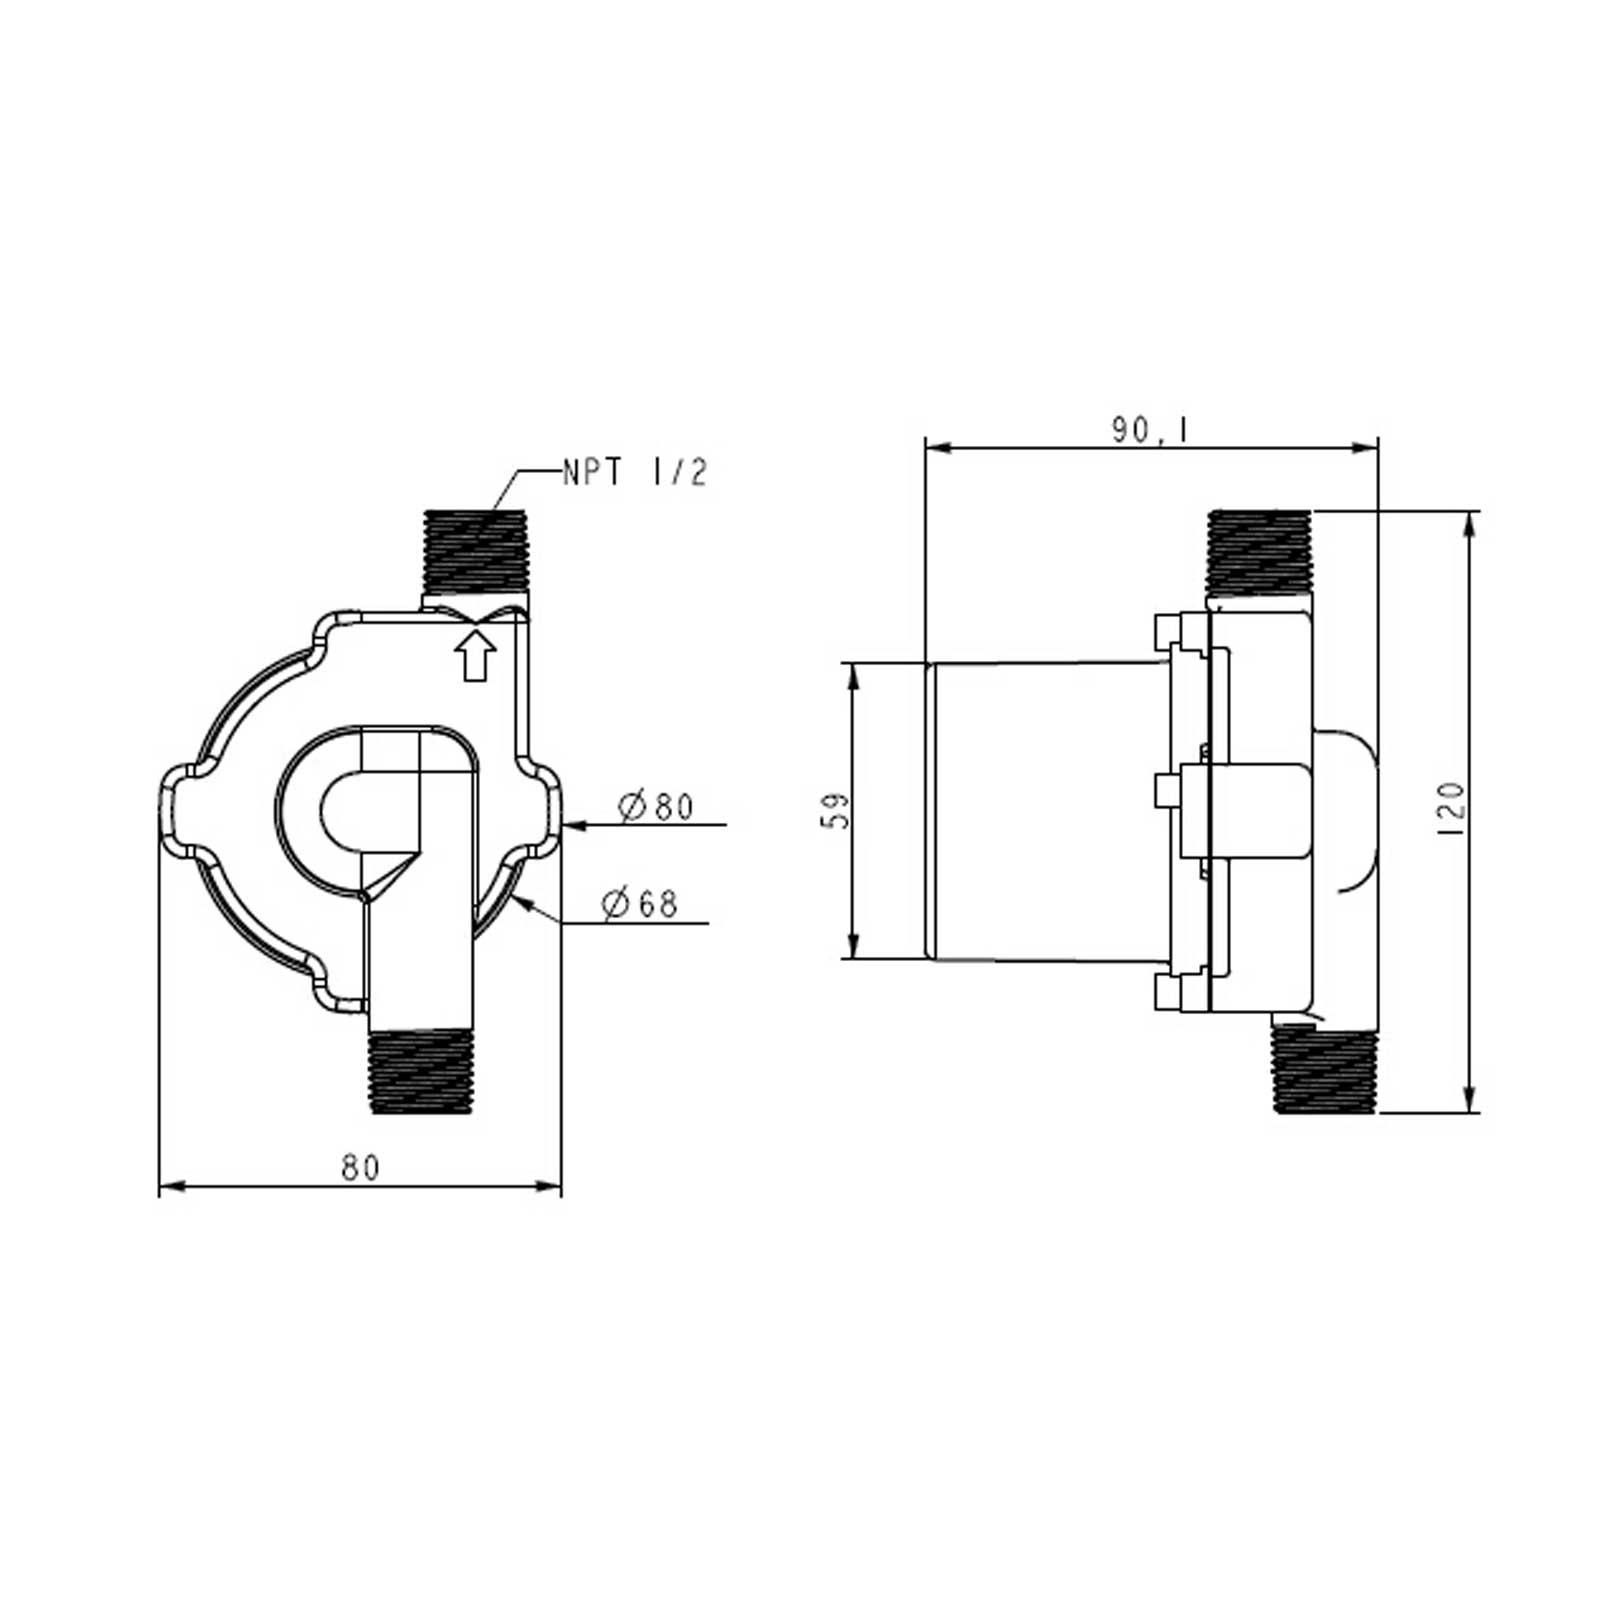 Pompa per mosto TOPSFLO TD5 acciaio inox